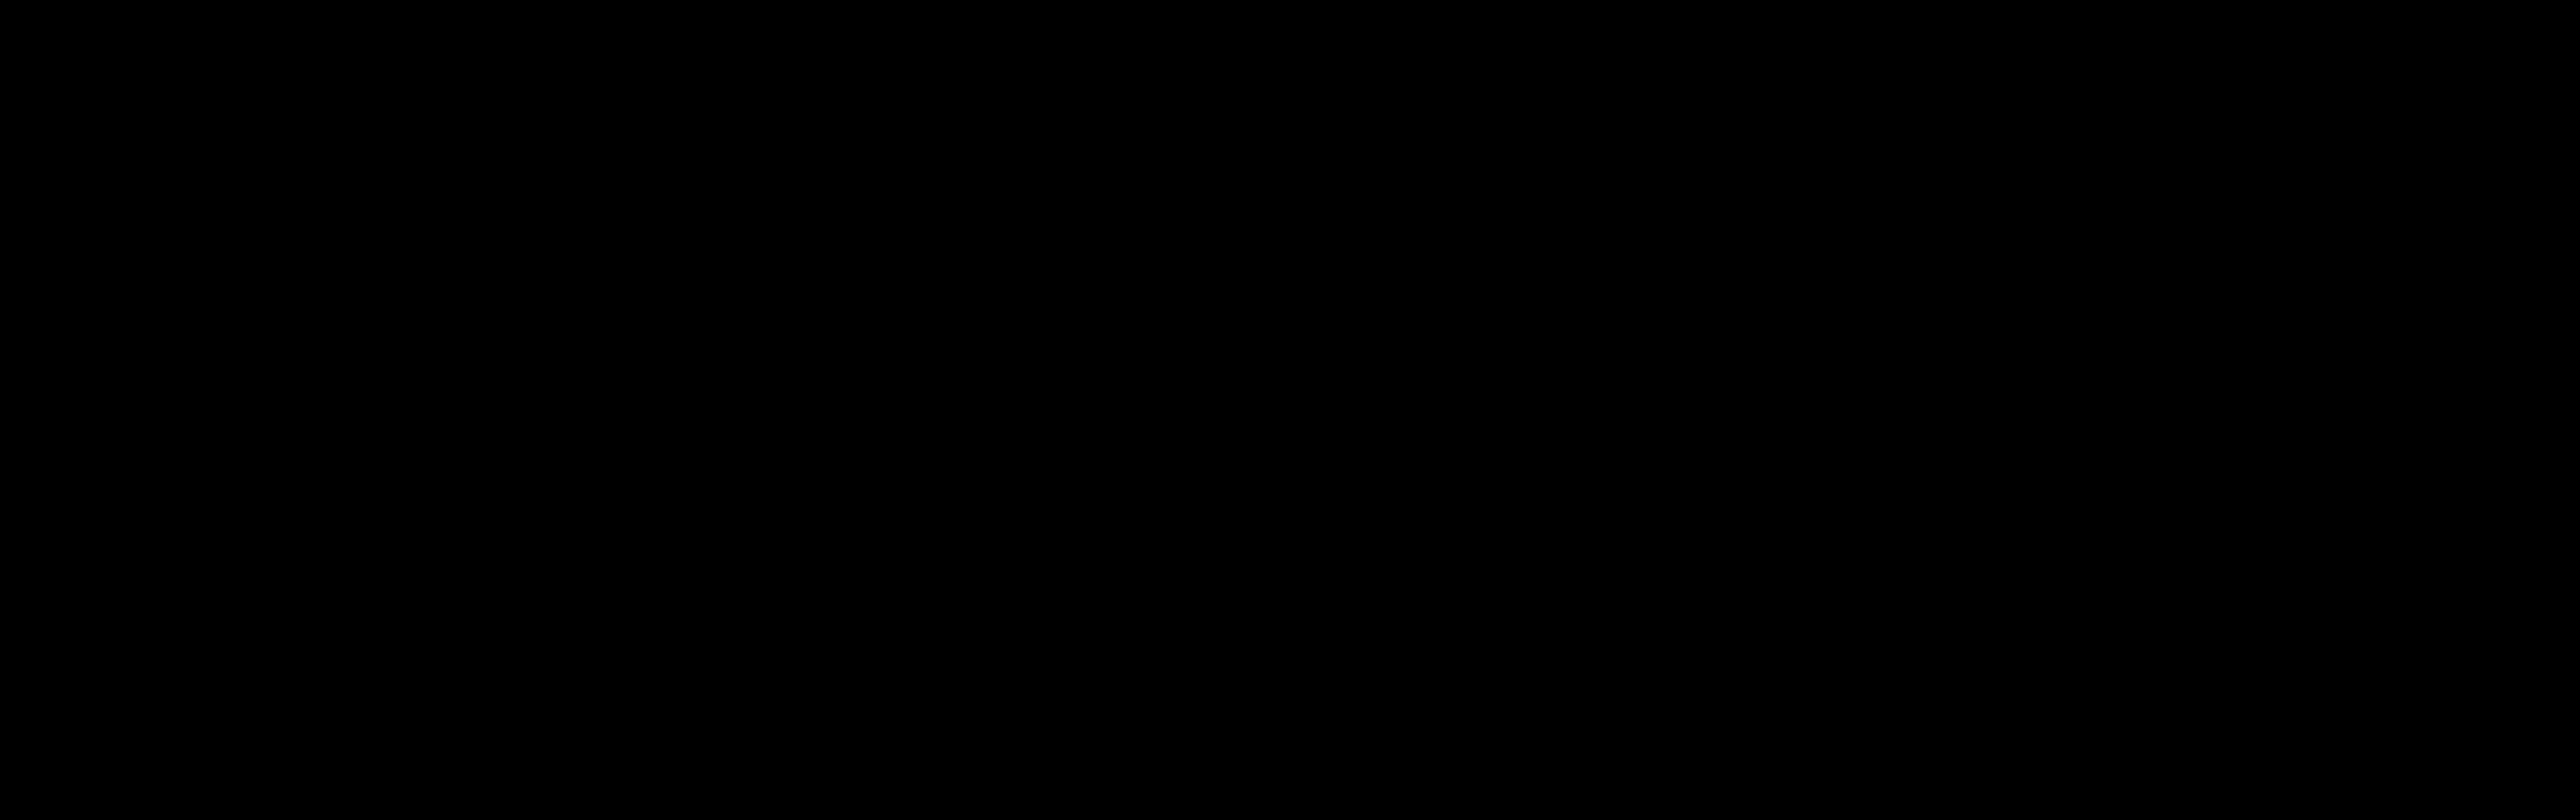 Image-seven